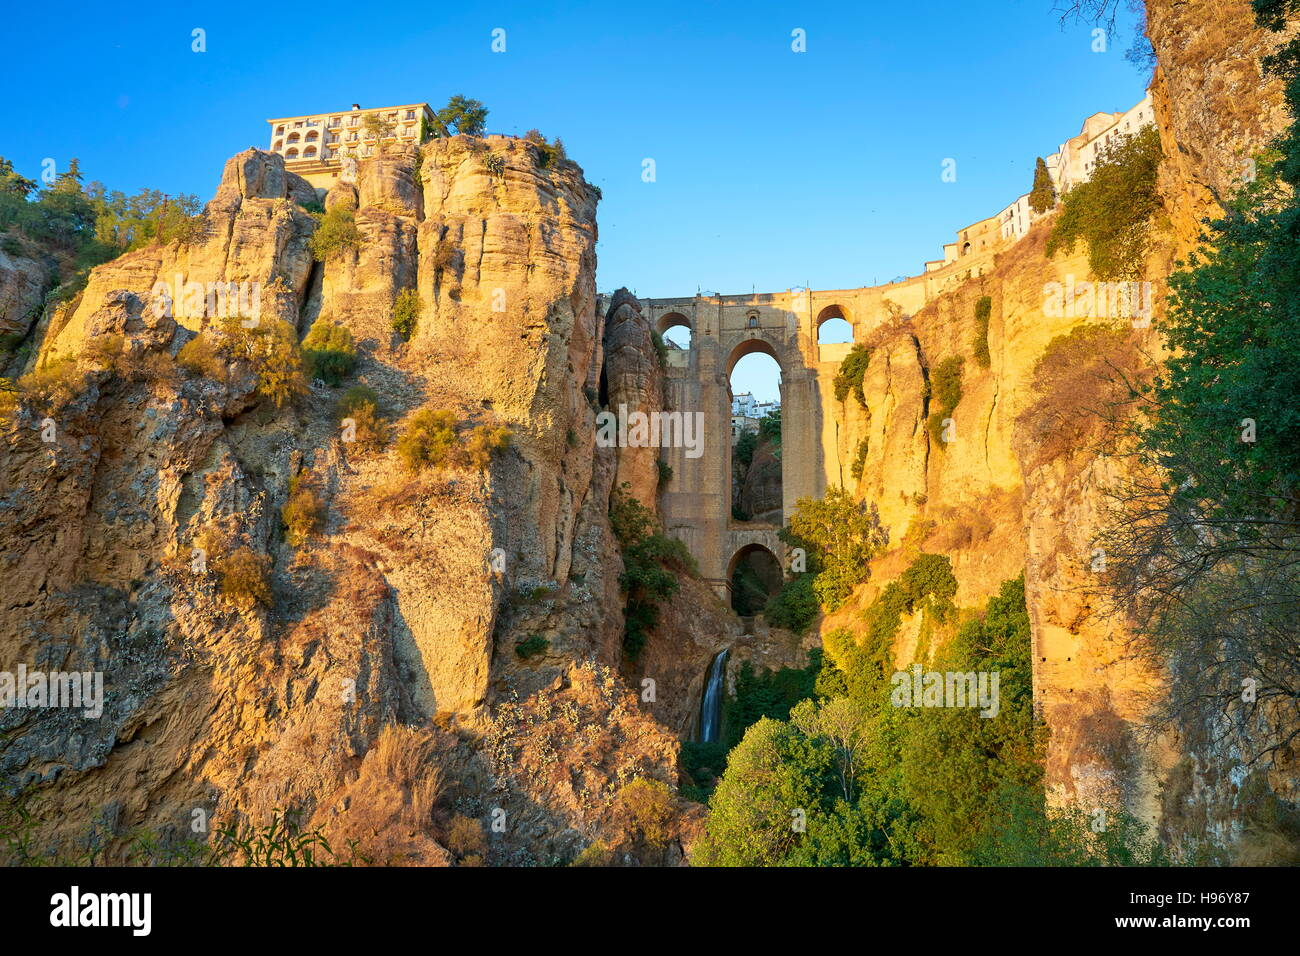 Ronda - Puente Nuevo Brücke, Andalusien, Spanien Stockbild